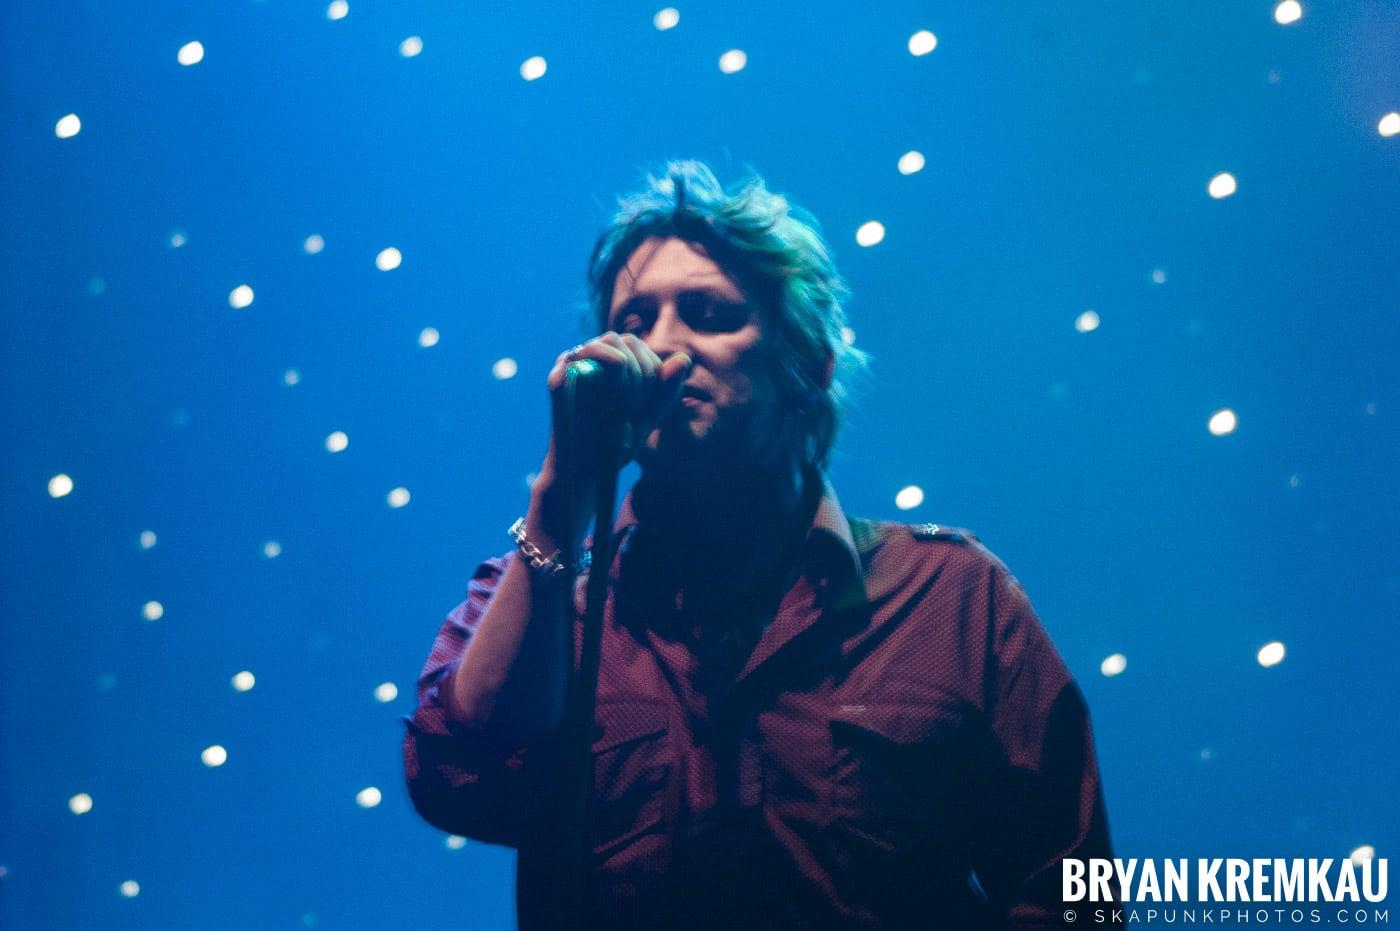 The Pogues @ Brixton Academy, London UK - 12.17.06 (13)